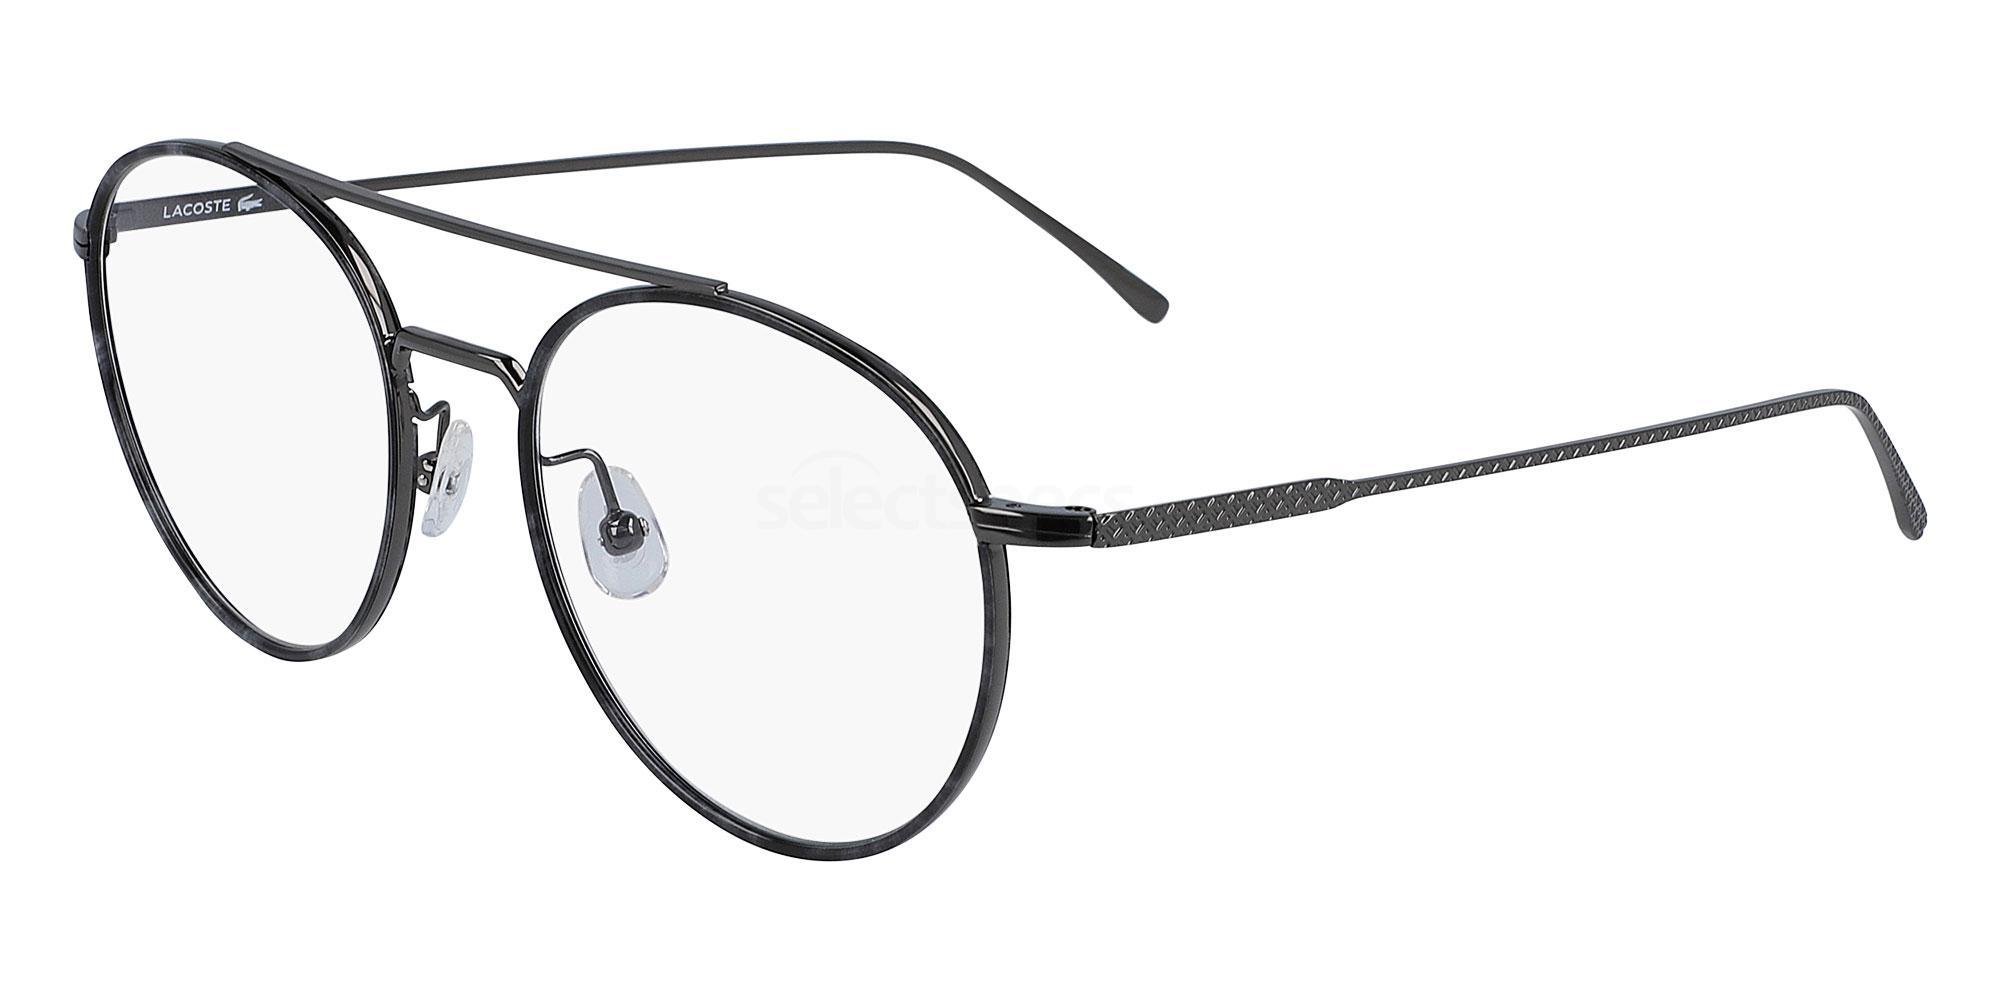 033 L2250 Glasses, Lacoste